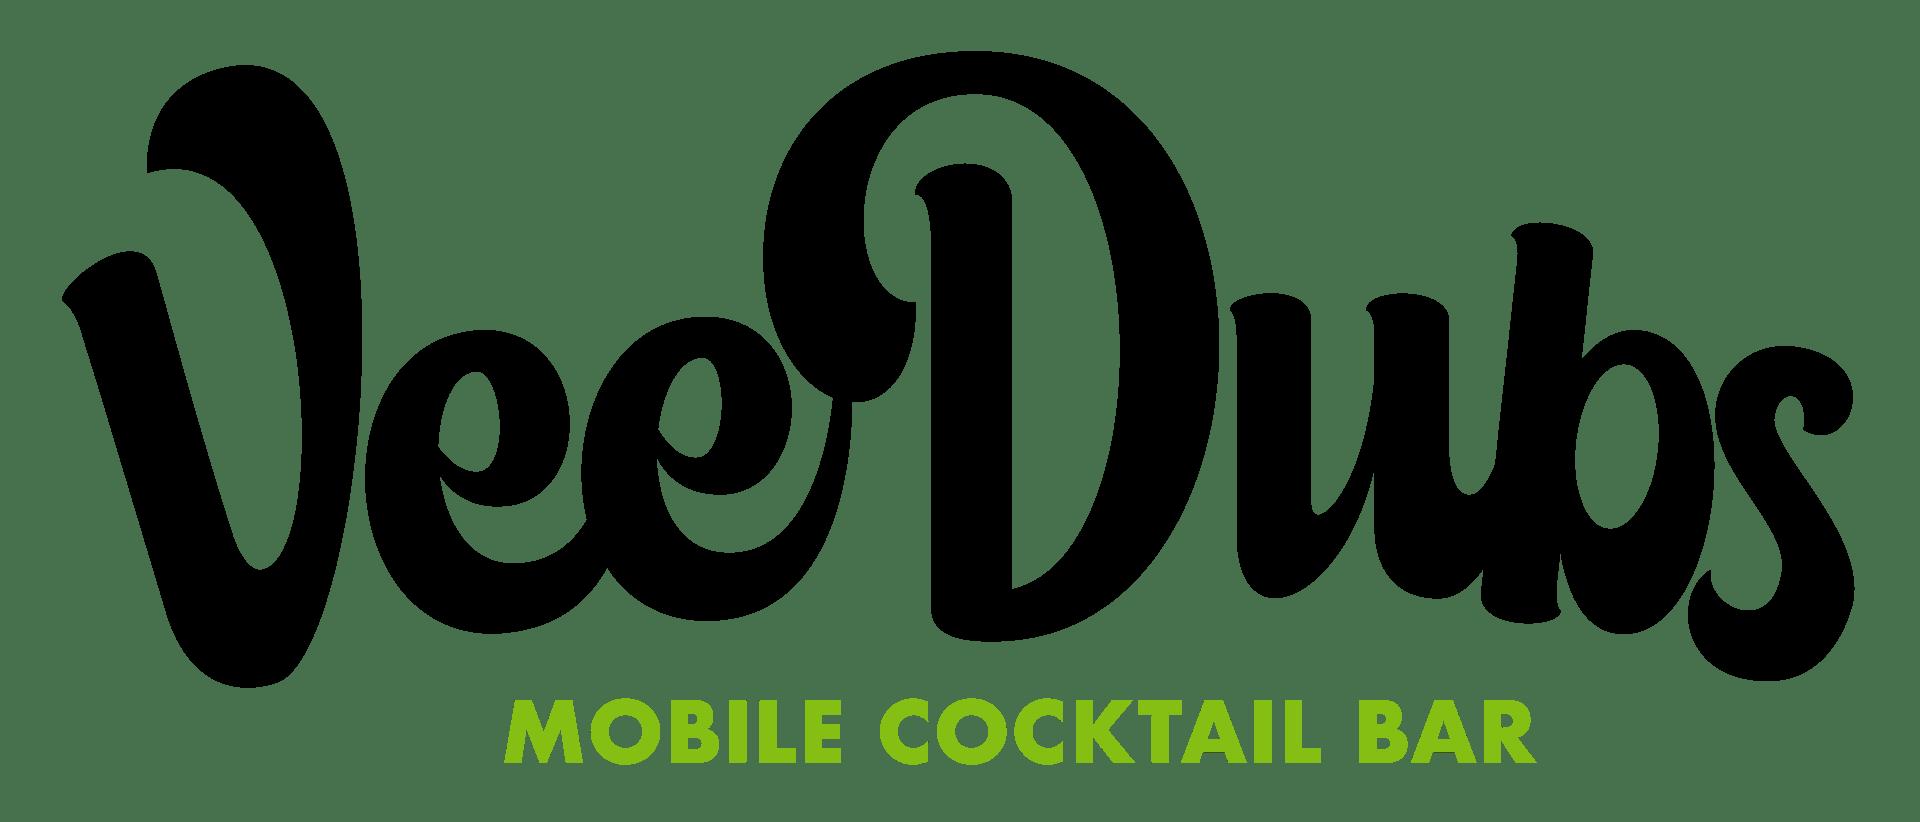 VeeDubs Mobile Cocktail Bar